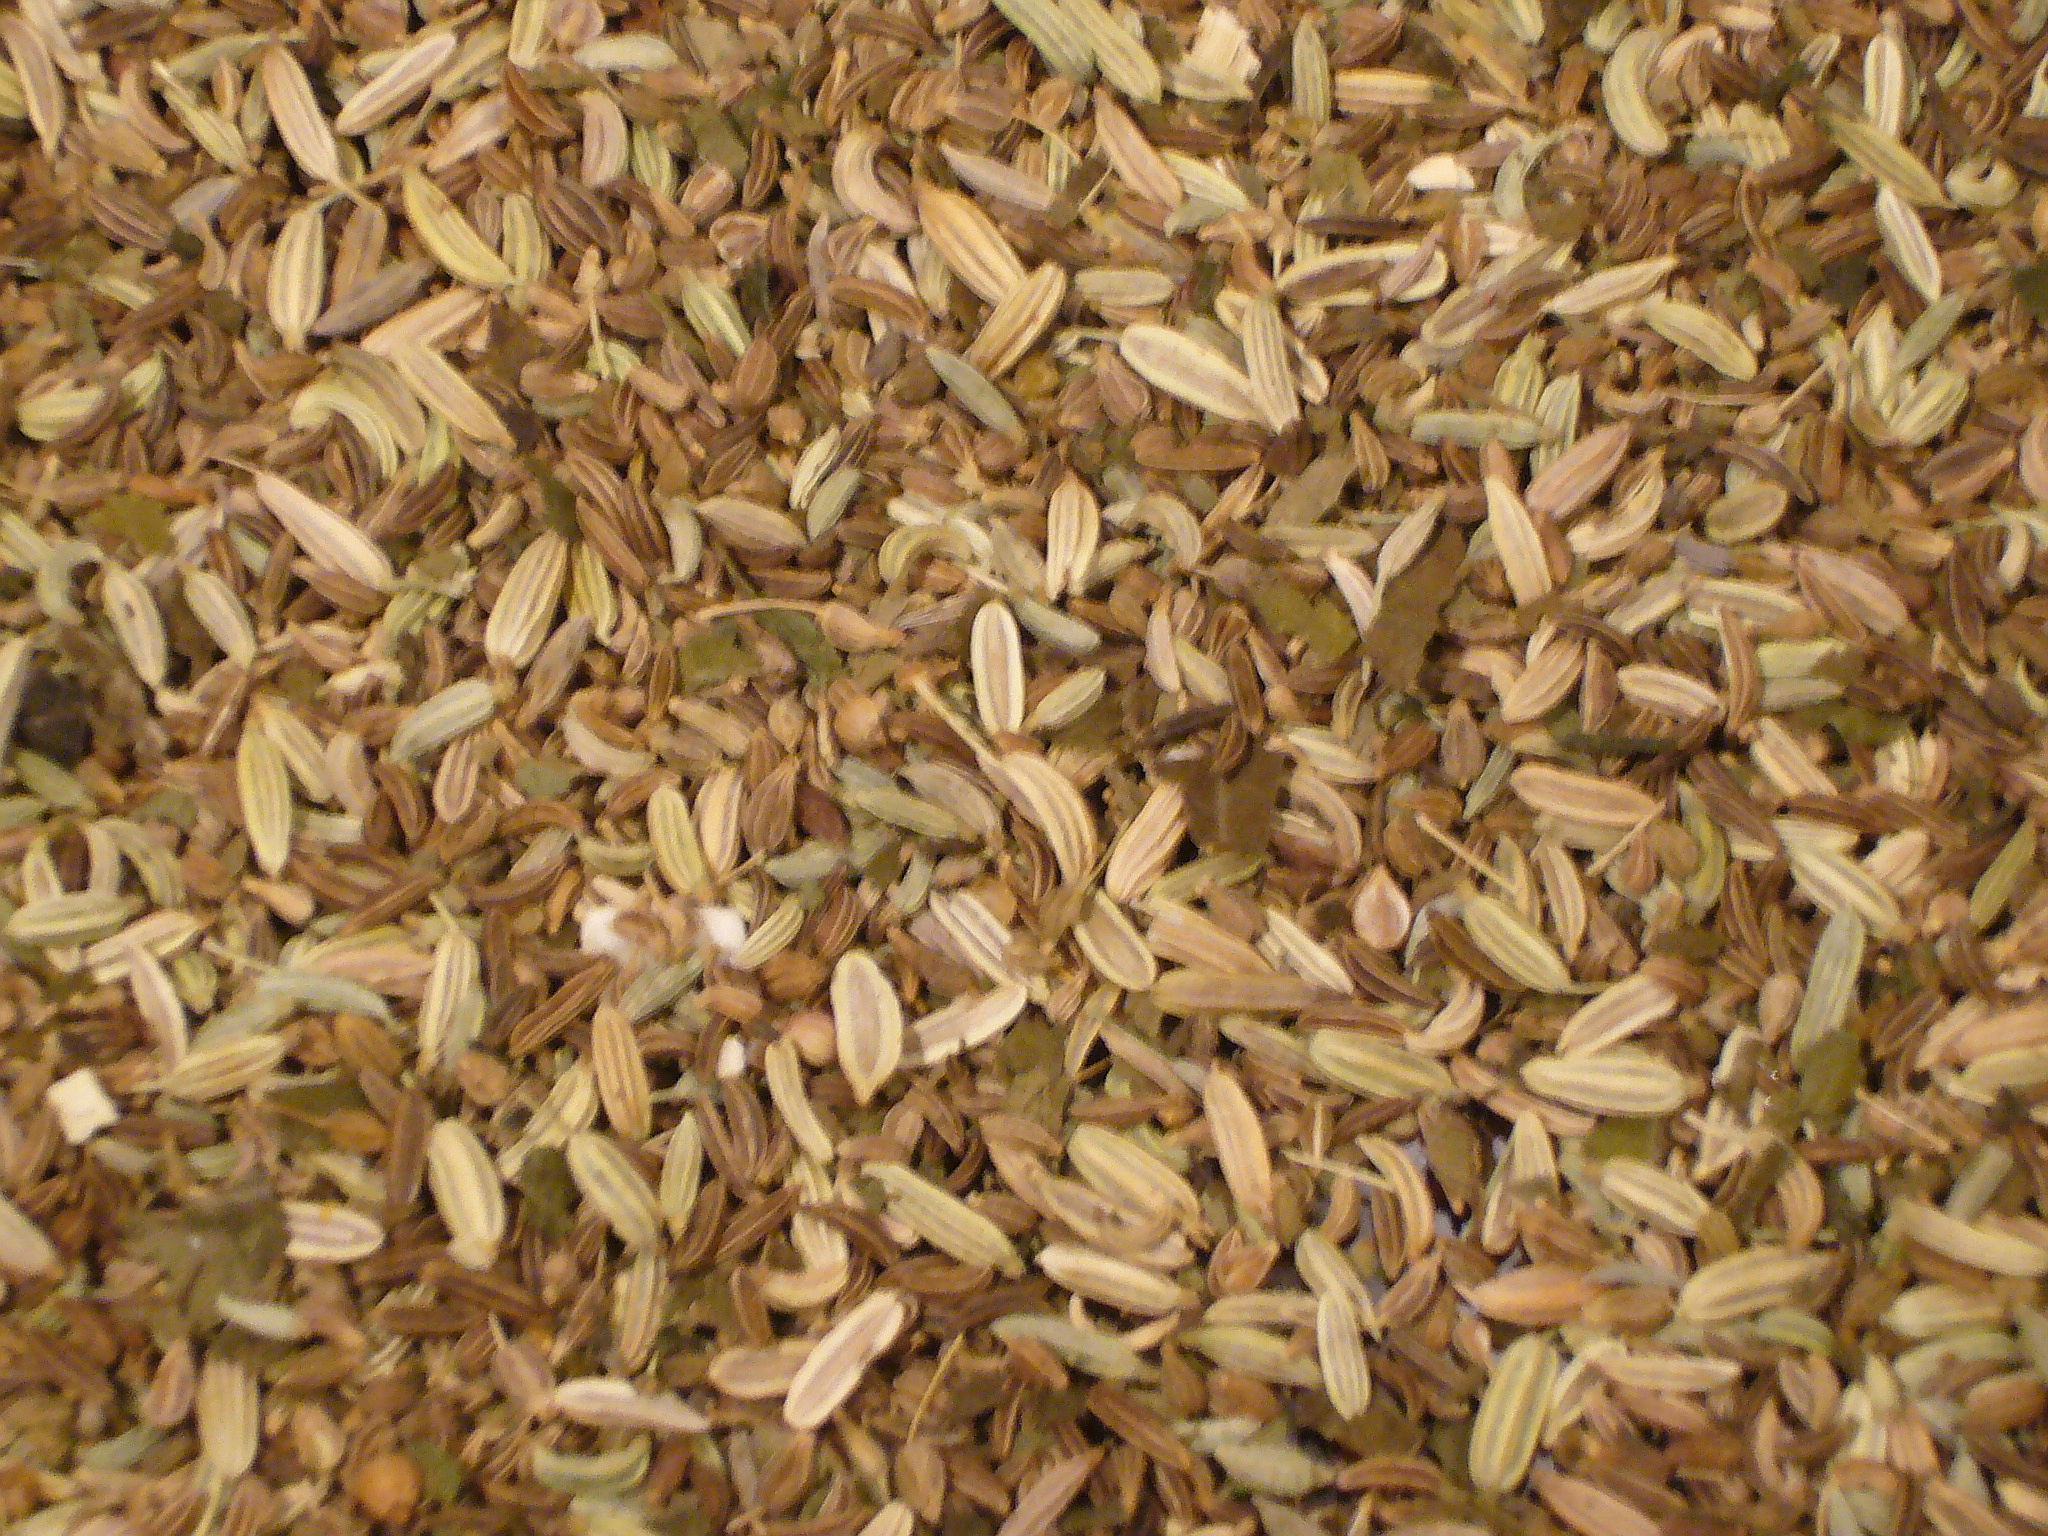 Basentee Anis-Kümmel-Fenchel Kräutermischung ohne Aroma